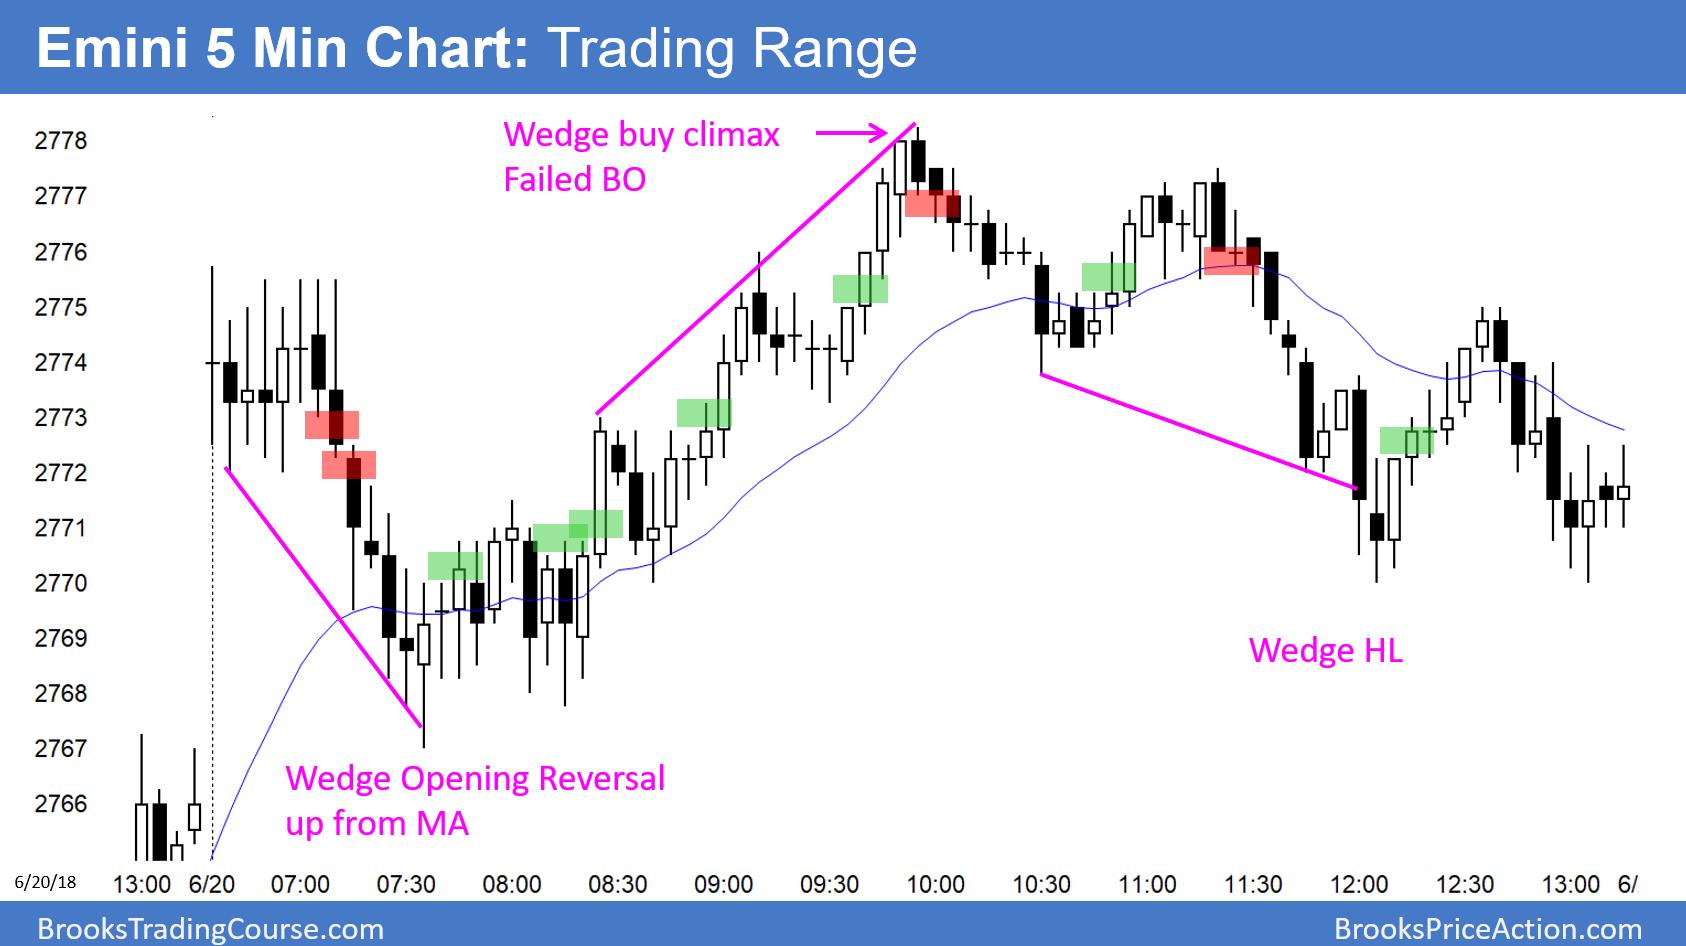 Emini 5 Min Chart : Trading Range